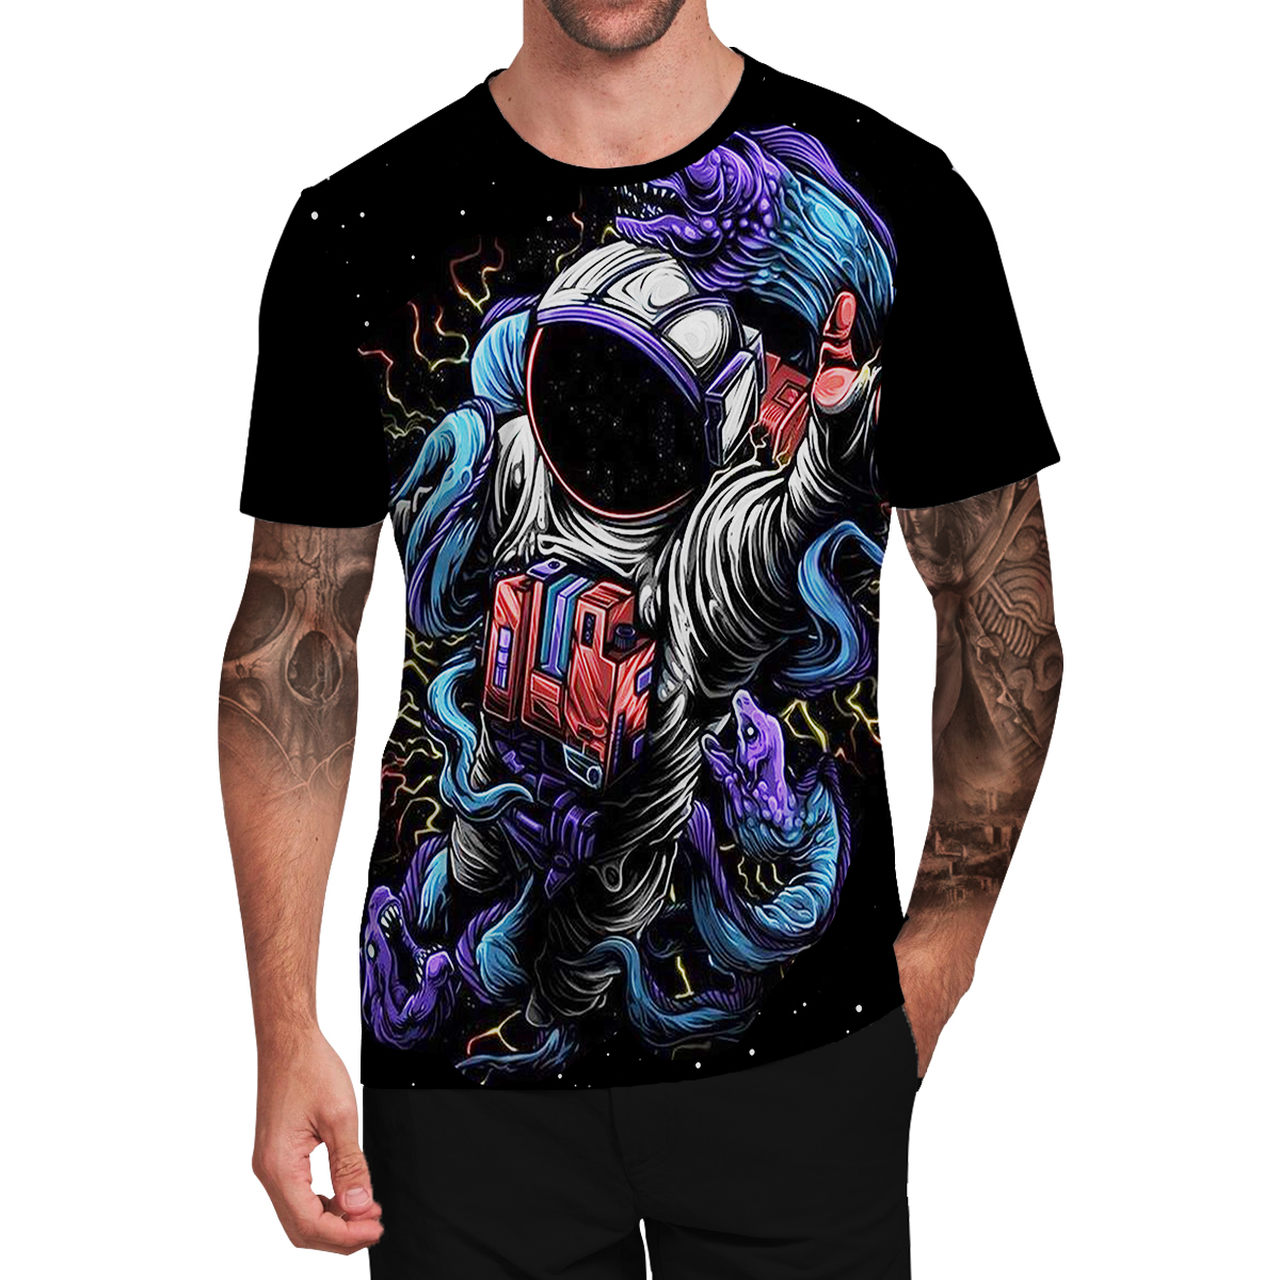 Stompy Camiseta Tattoo Tatuagem Caveira Skull 86